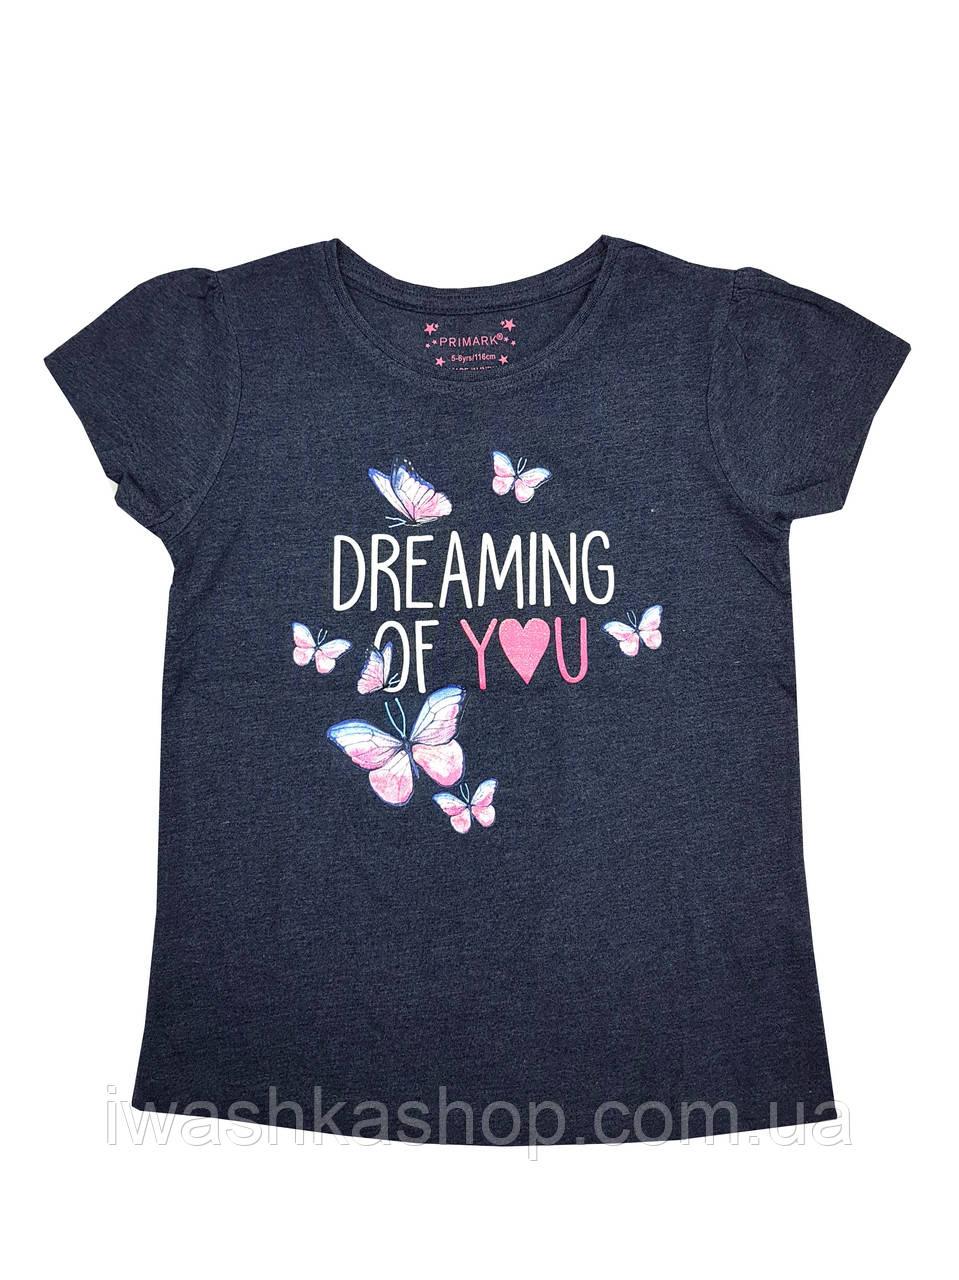 Тёмно-синяя футболка с бабочками для девочки, Primark р. 122